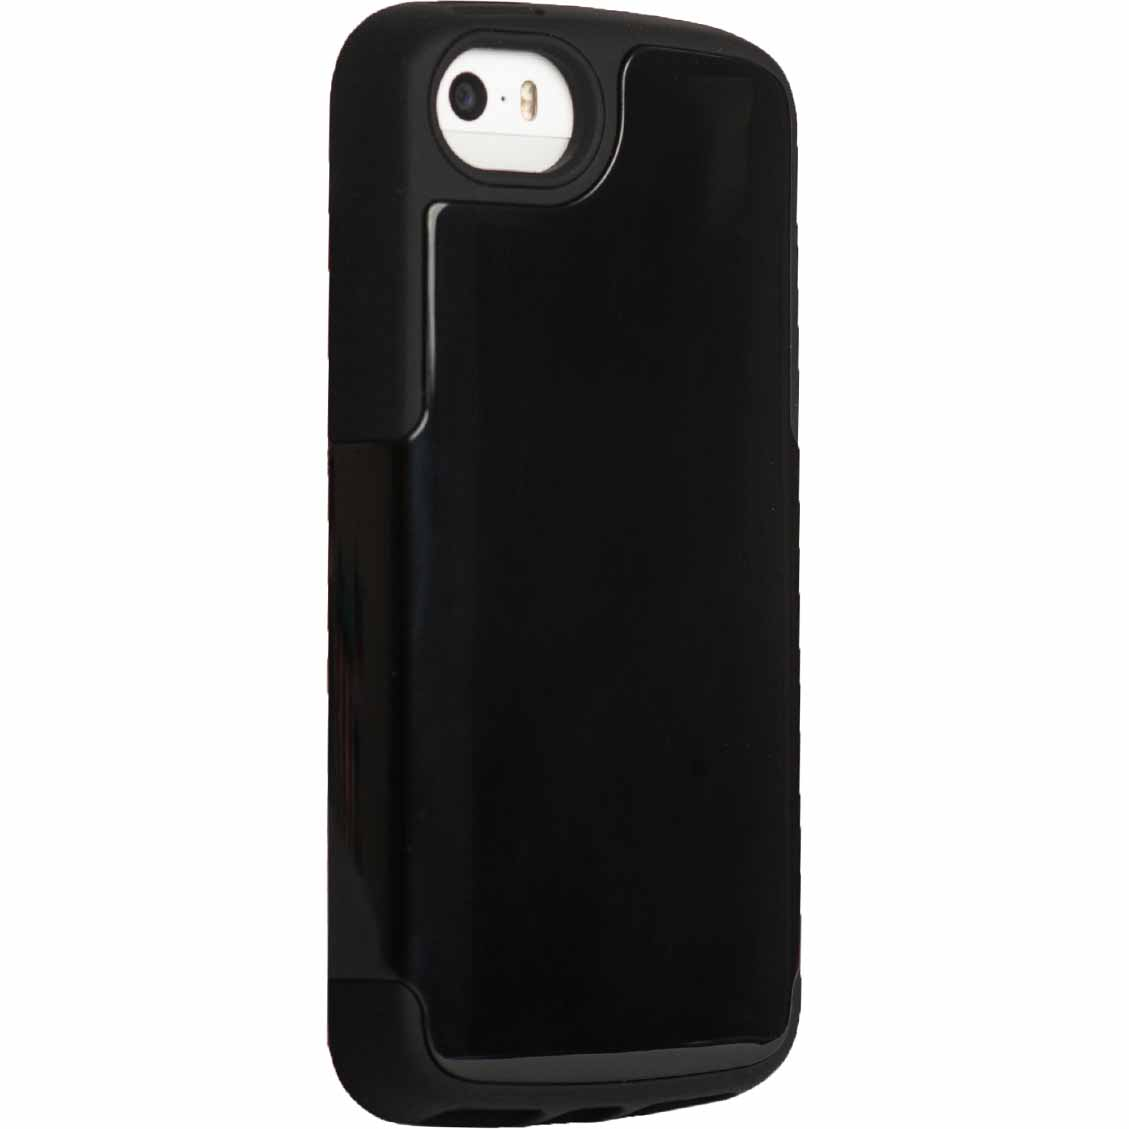 Agent 18 Hero Phone Case for iPhone 5/5s - Black